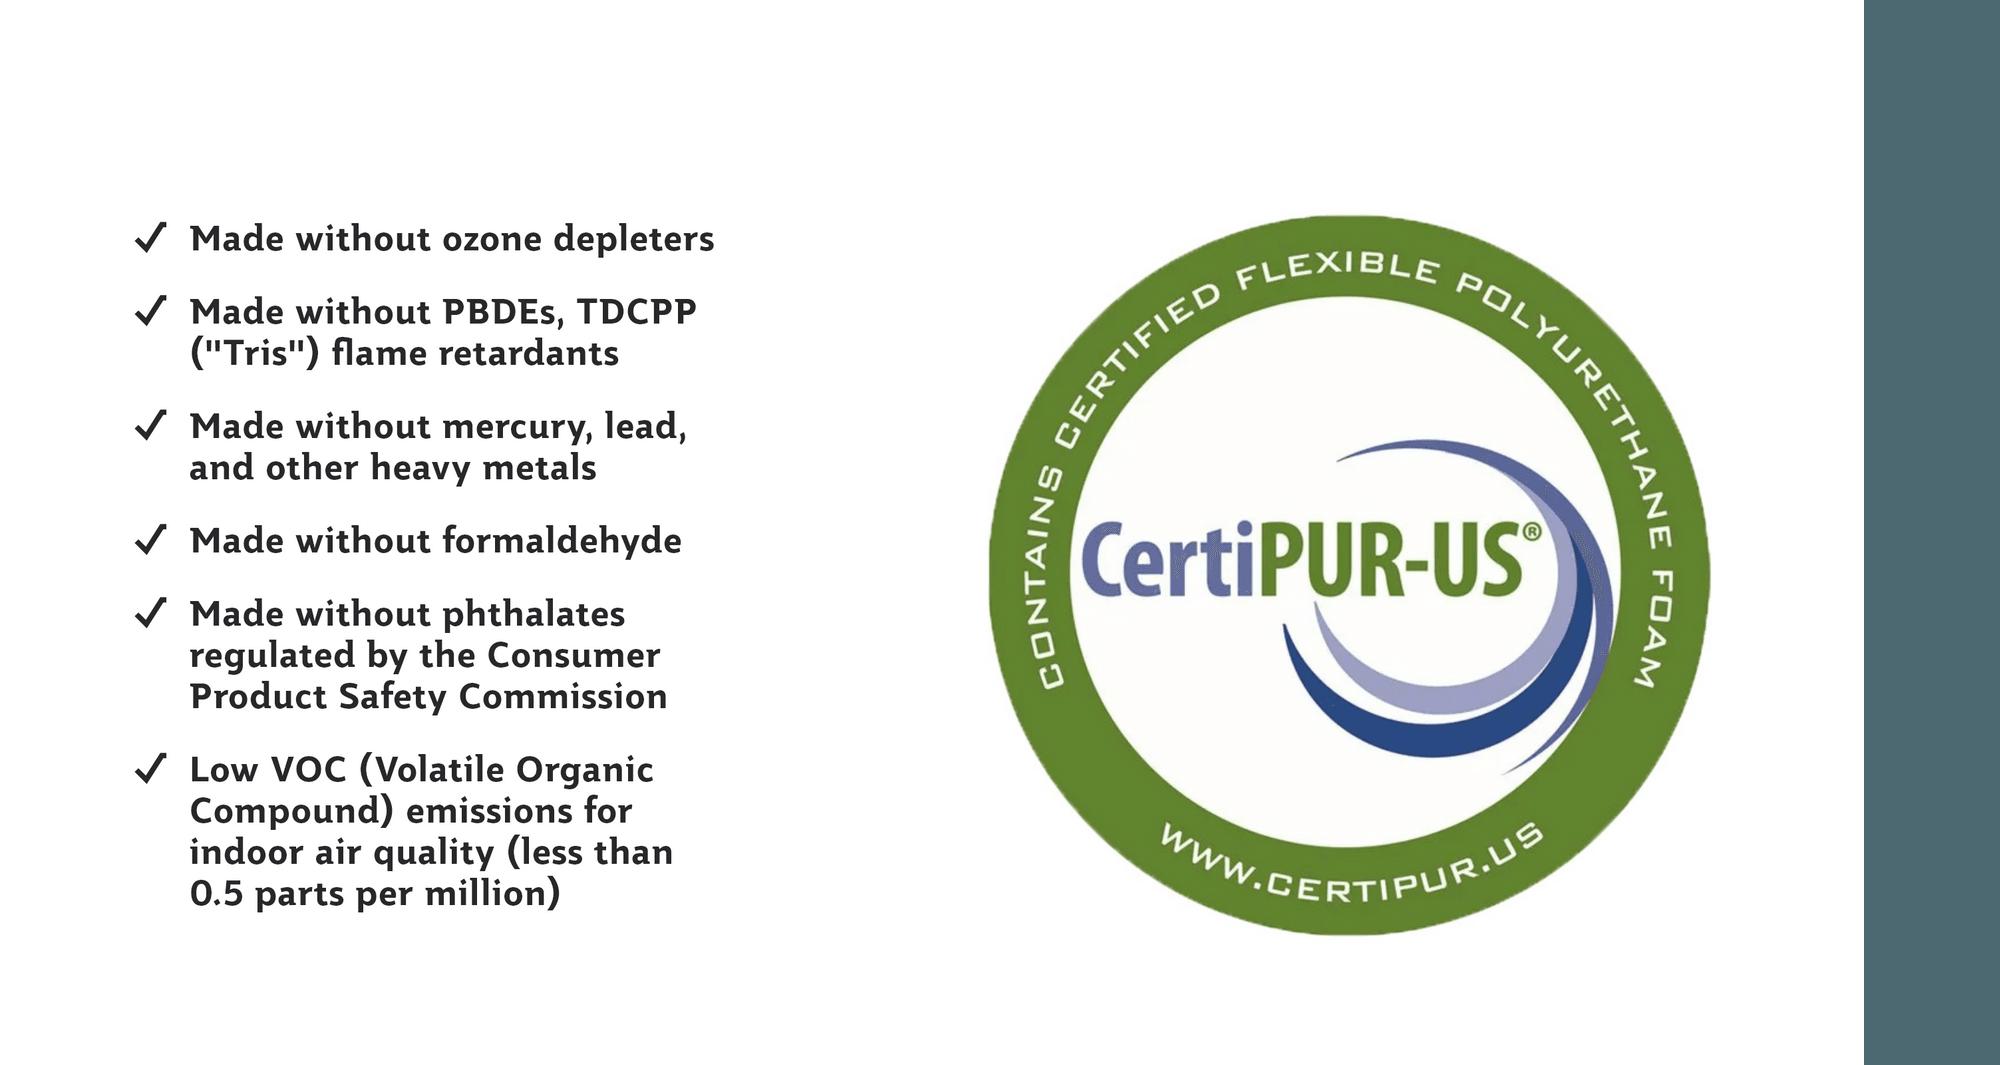 Certi-PURus-logo-v2-claims-noborder-flipped.png